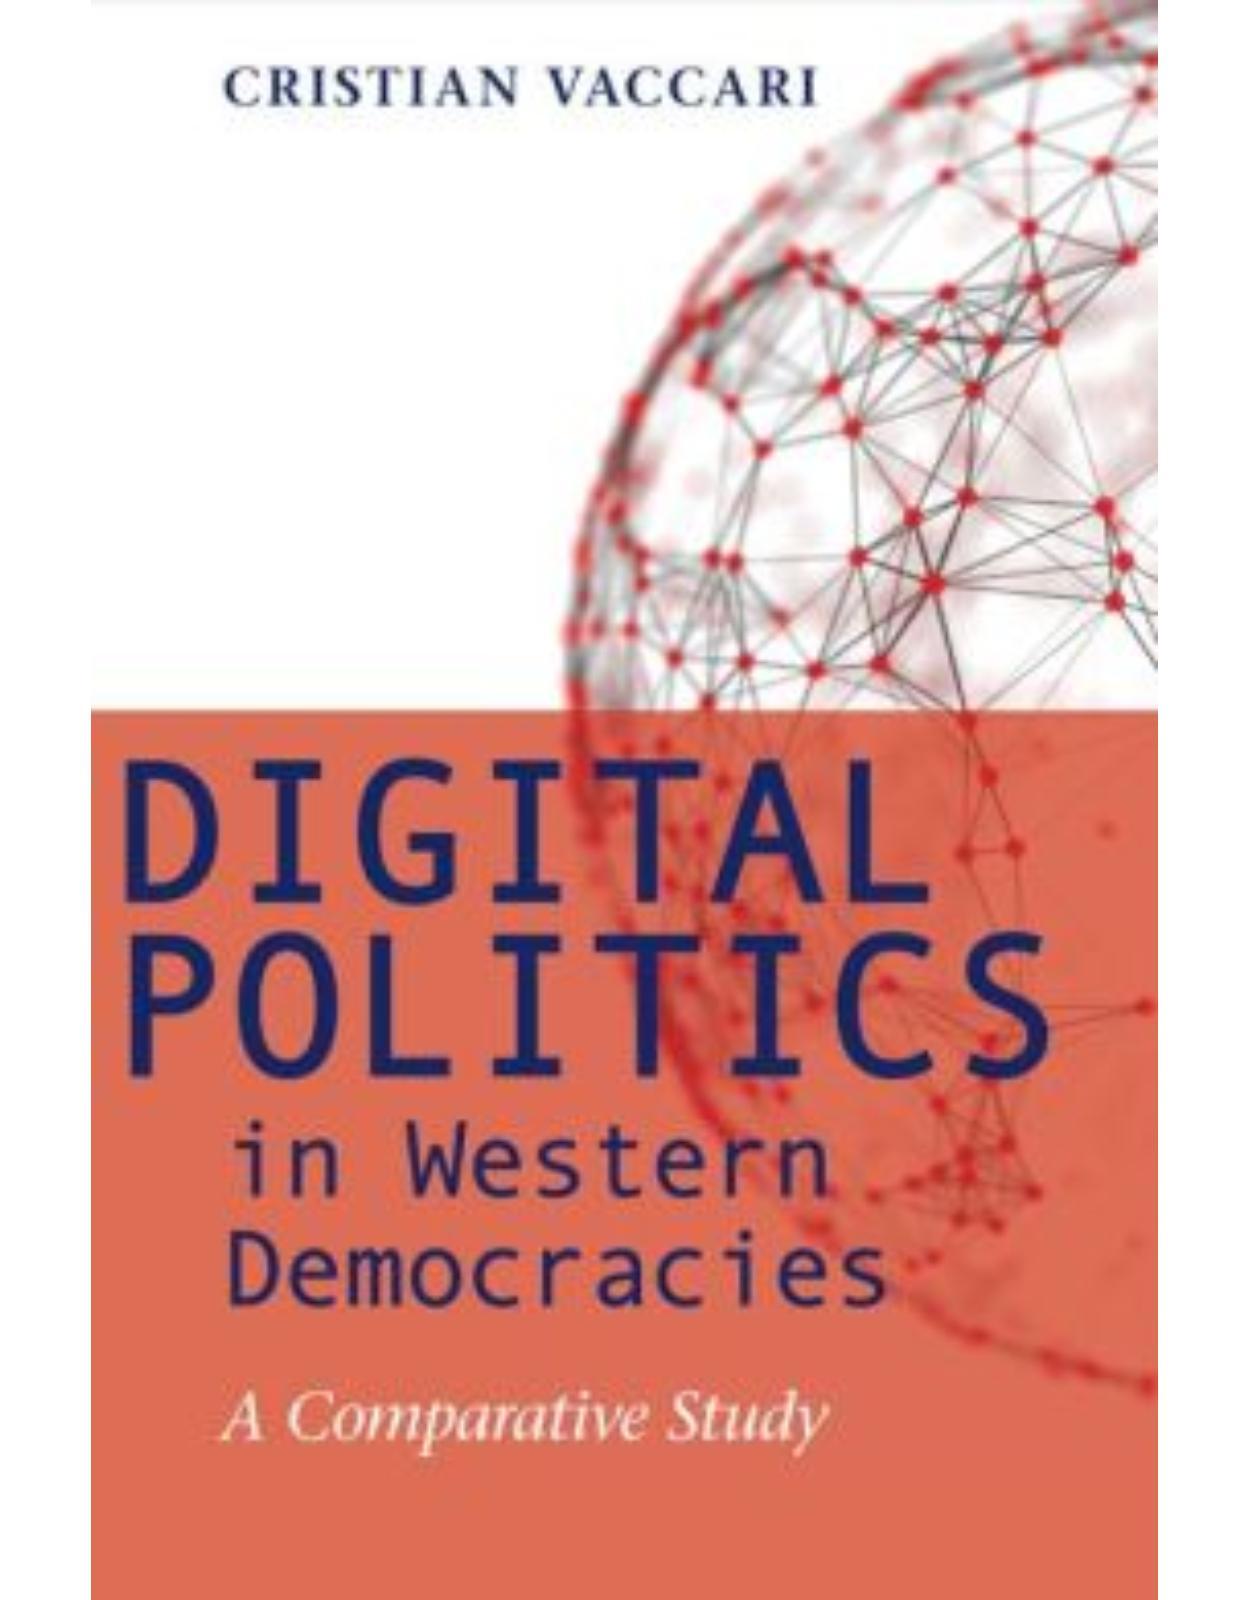 Digital Politics in Western Democracies. A Comparative Study